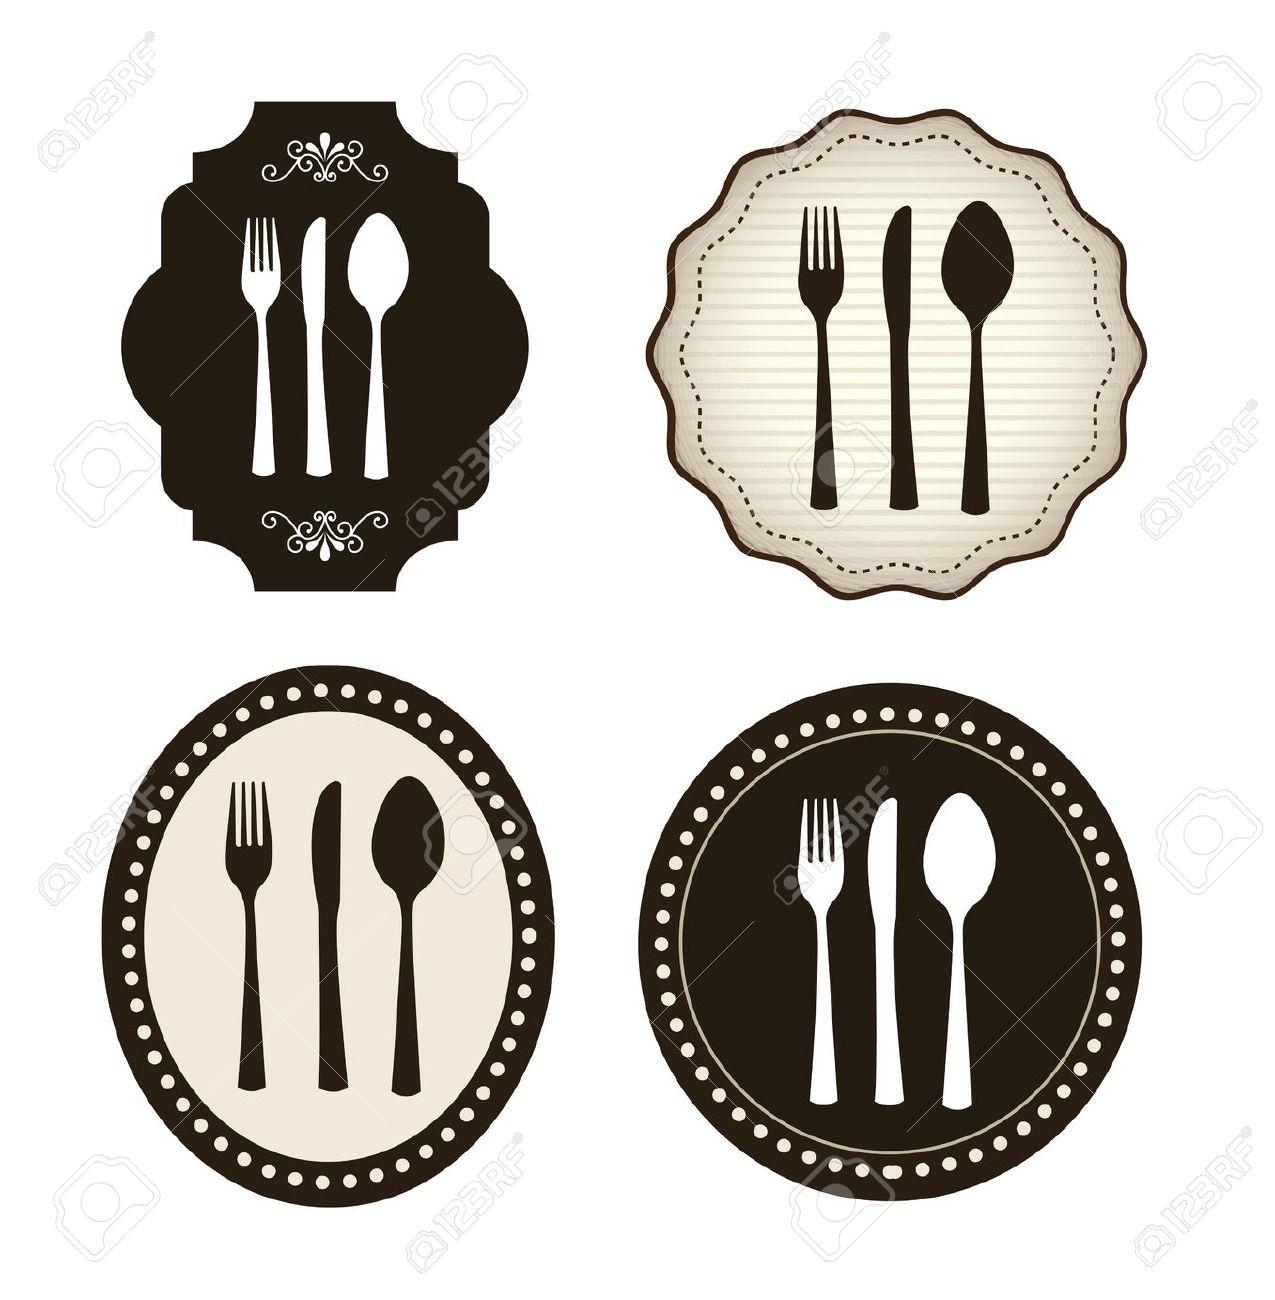 Images: Vintage Cutlery Clip Art.